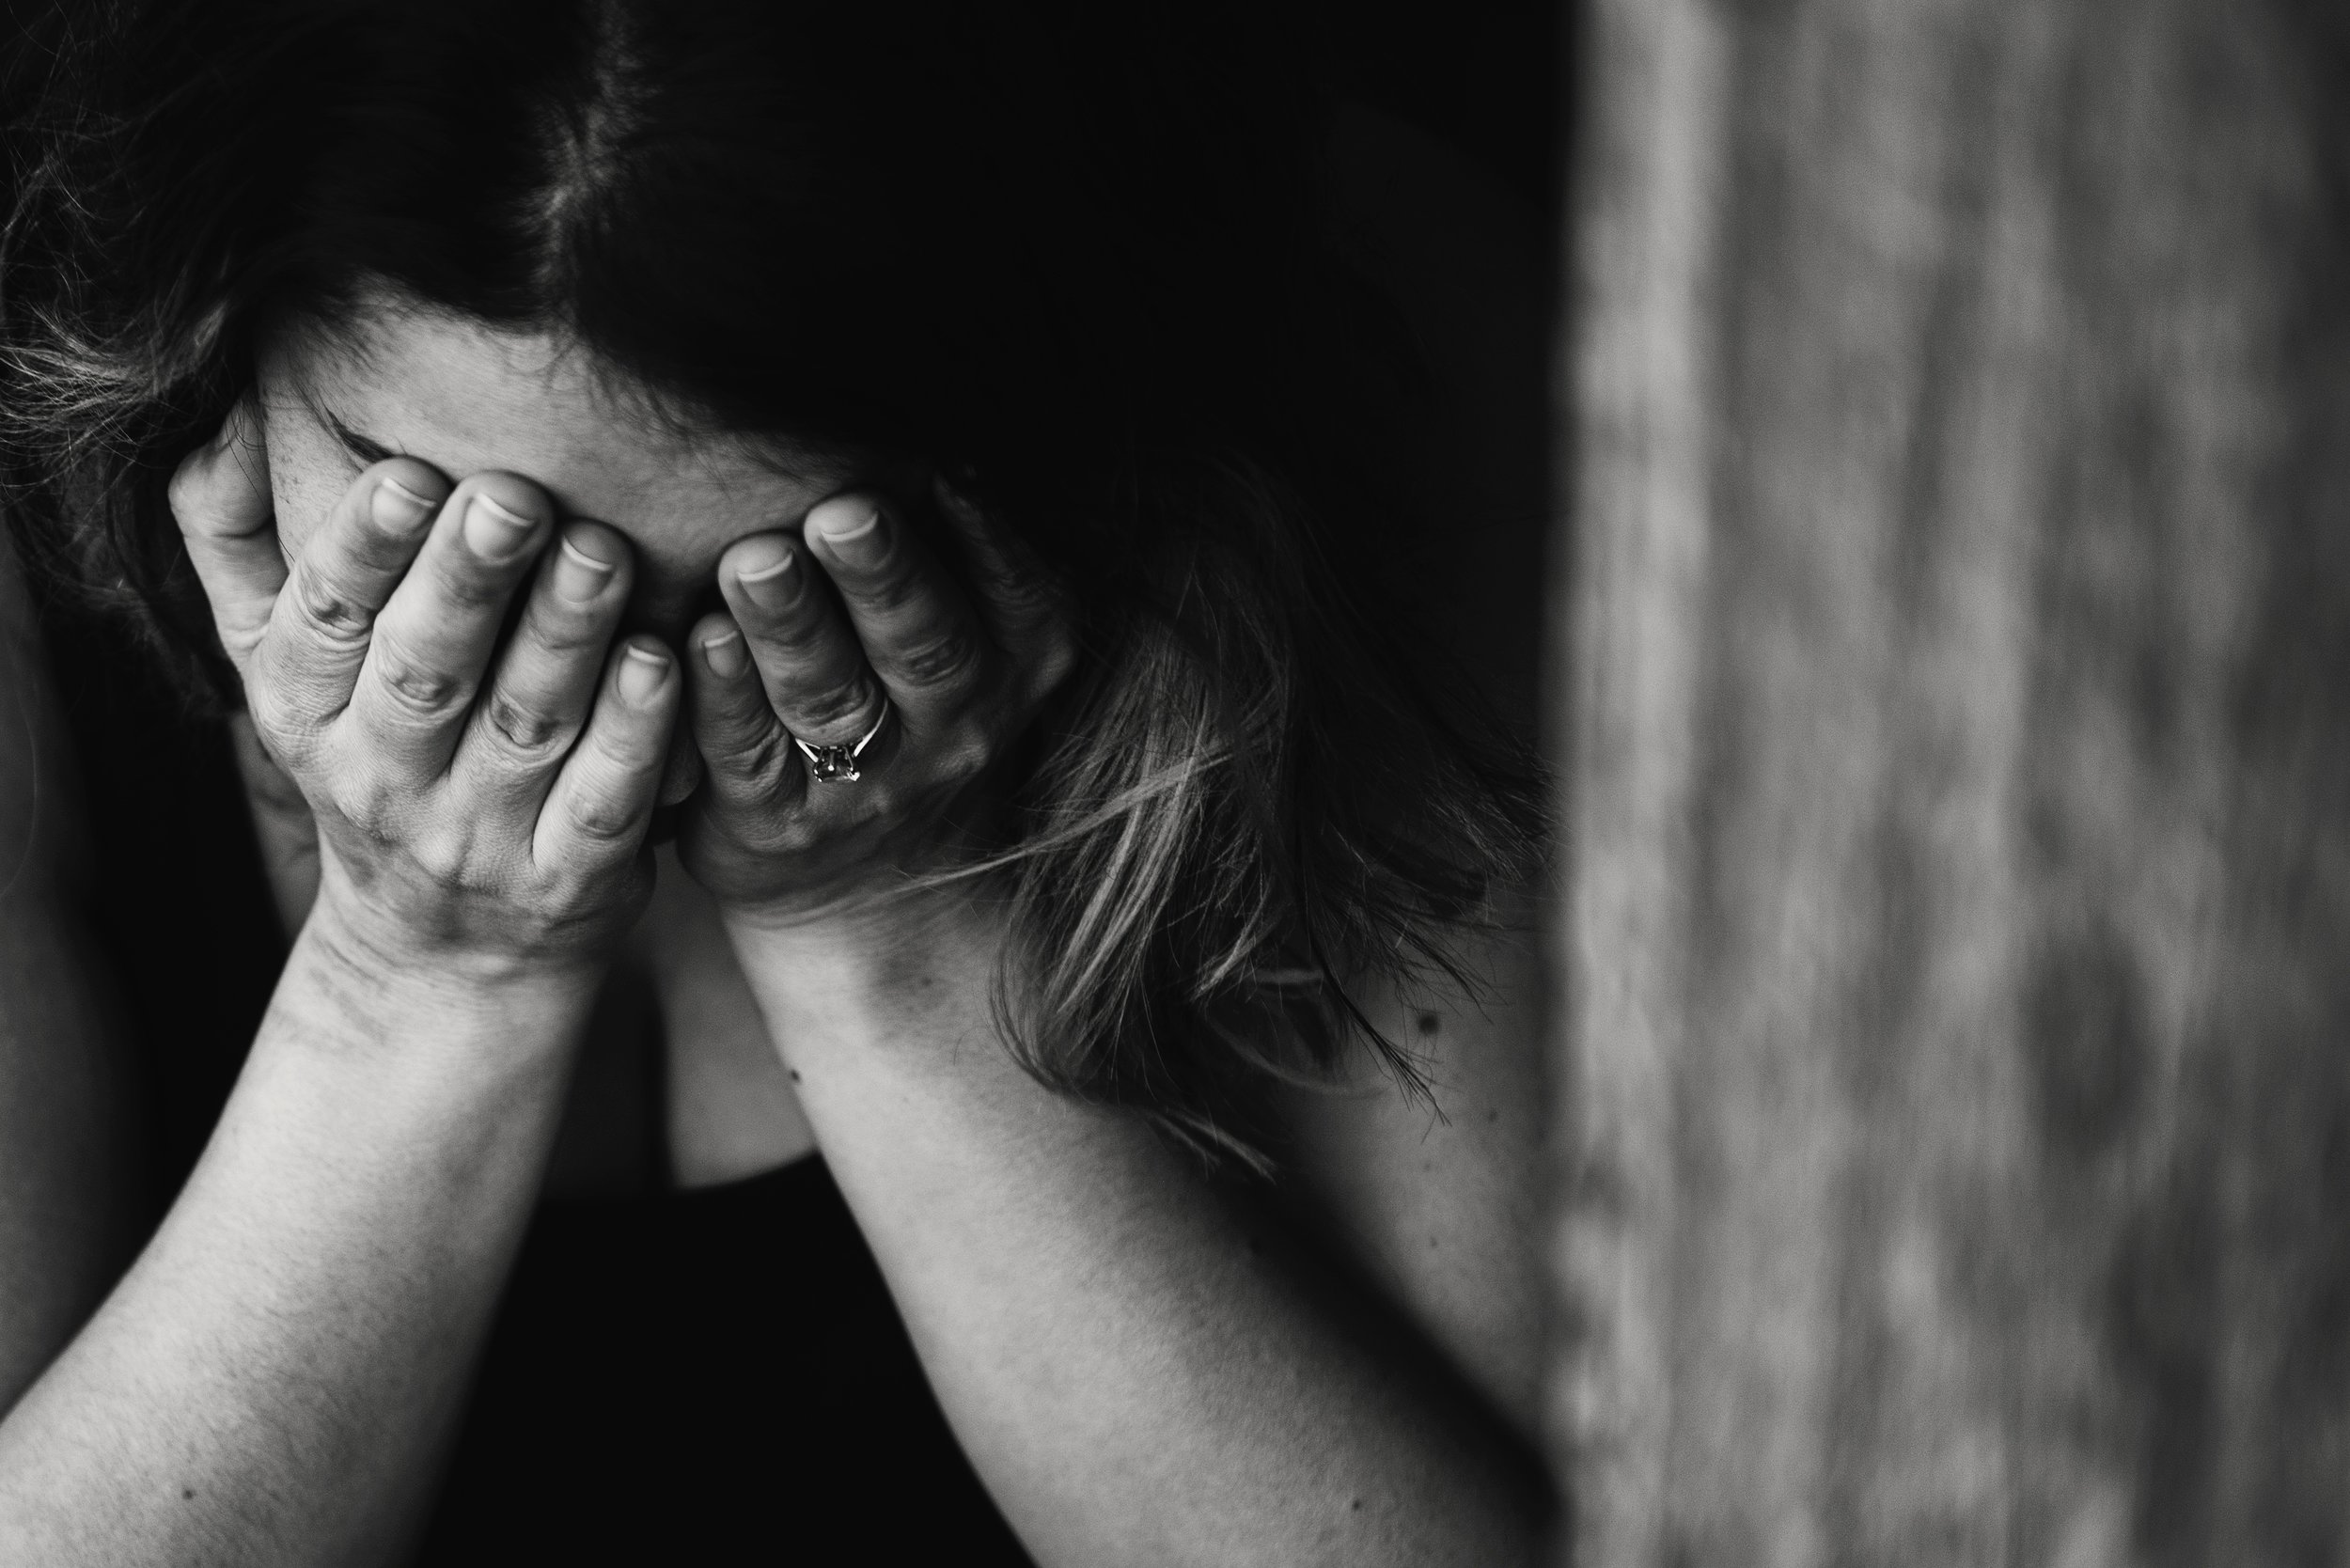 adult-alone-anxious-568027.jpg